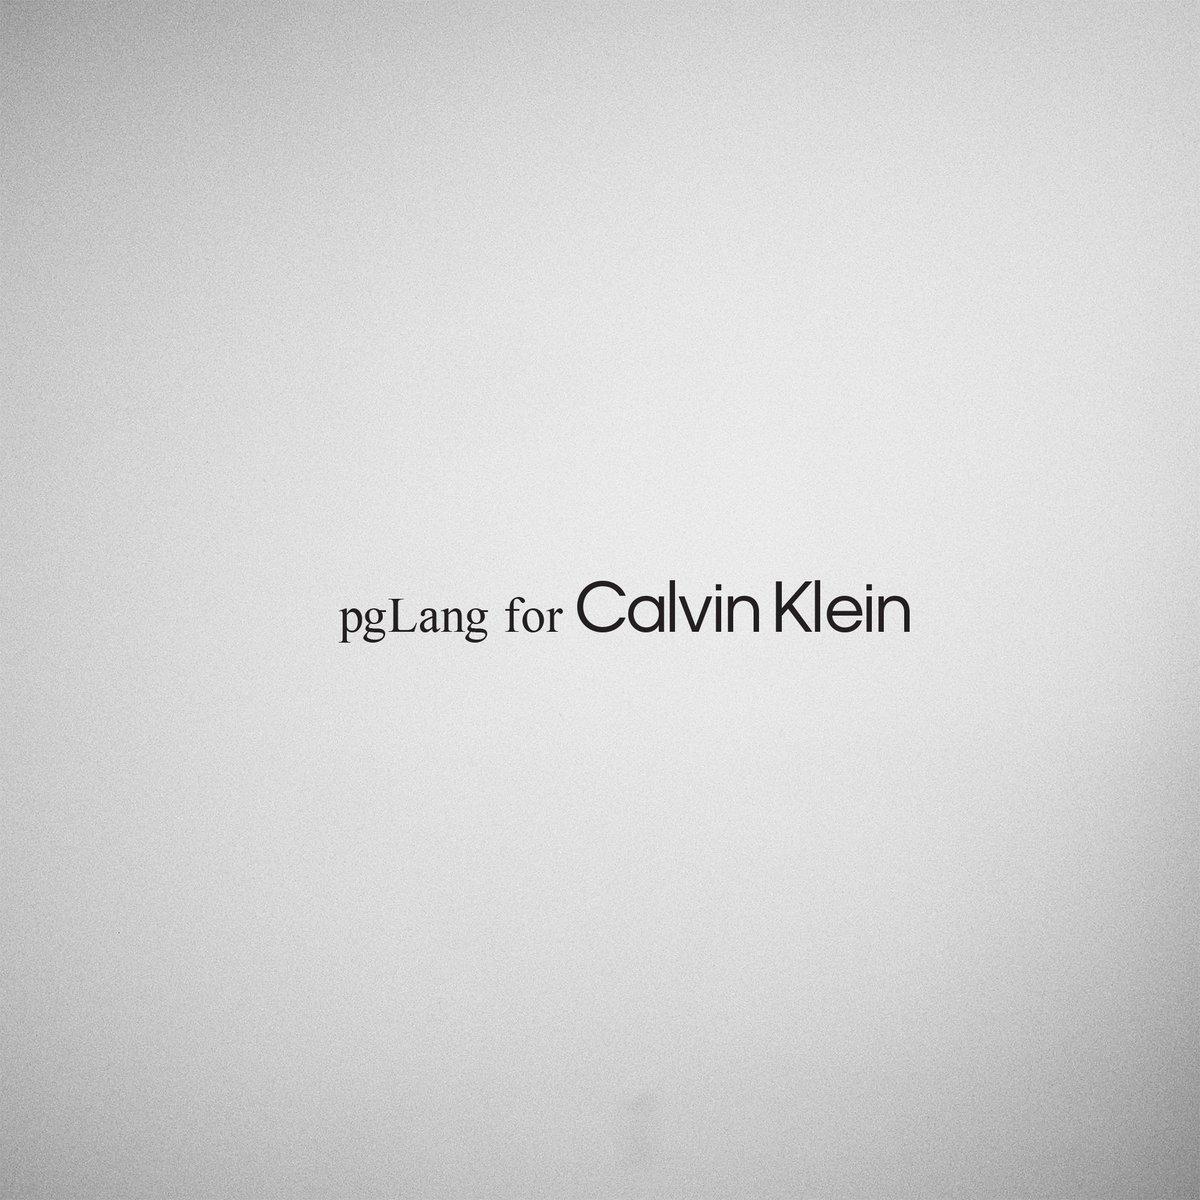 pgLang for @CalvinKlein